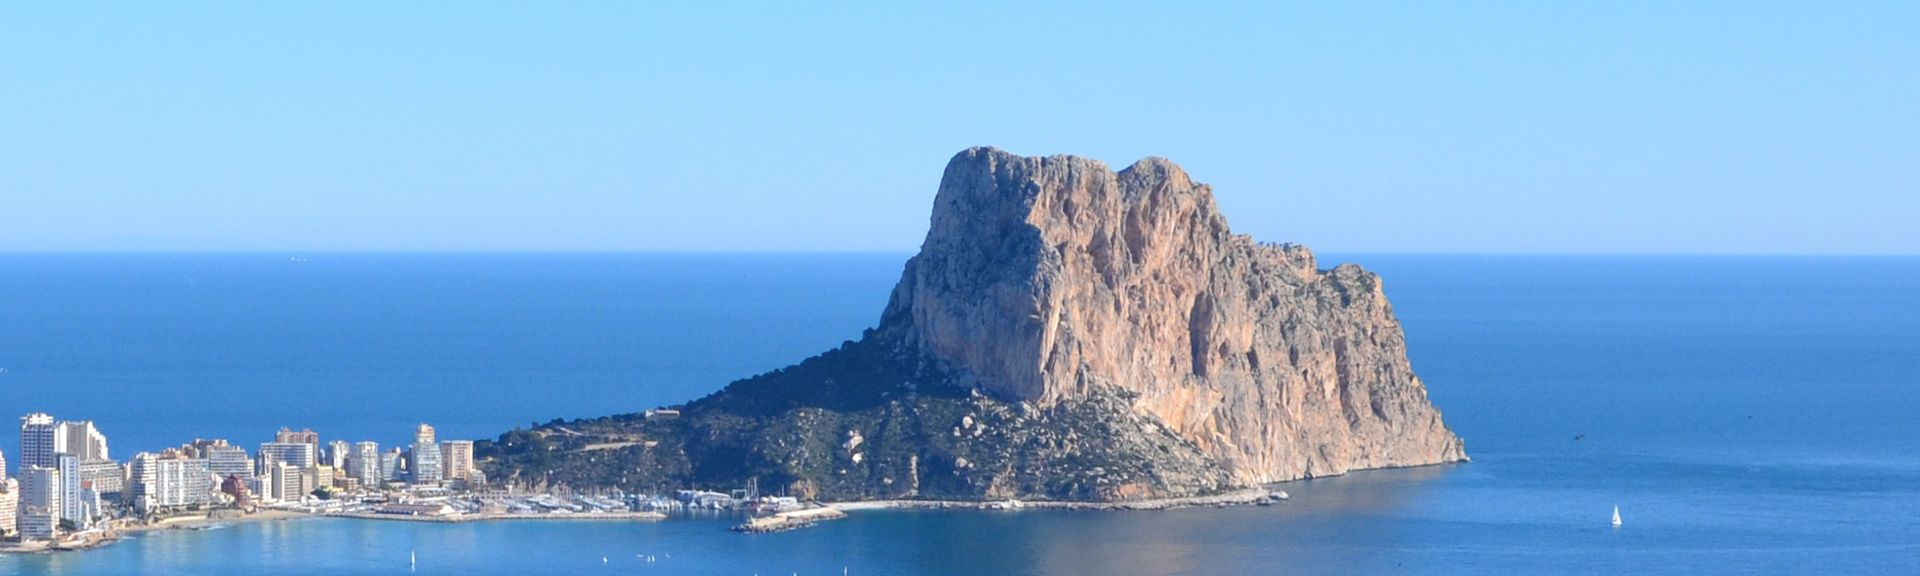 Montserrat, Valencia, Espanja